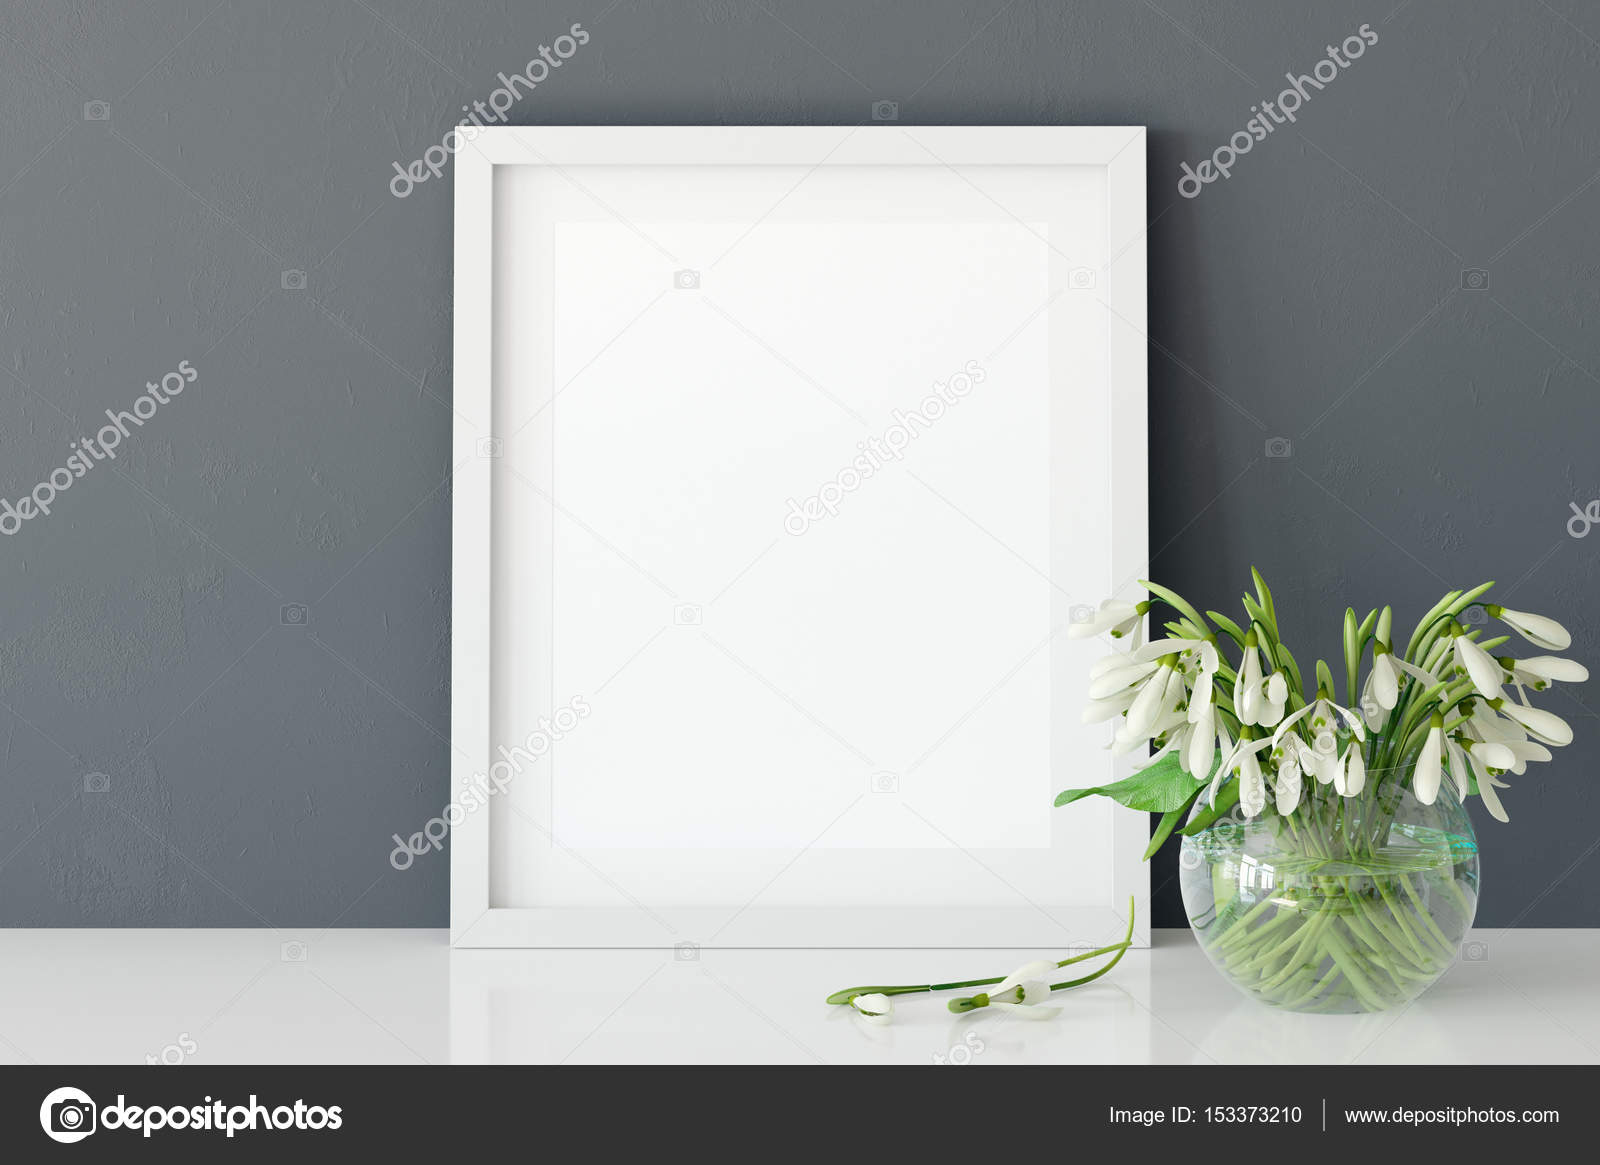 Posters In Interieur : Mock up poster im wohnzimmer interieur u stockfoto yuri u